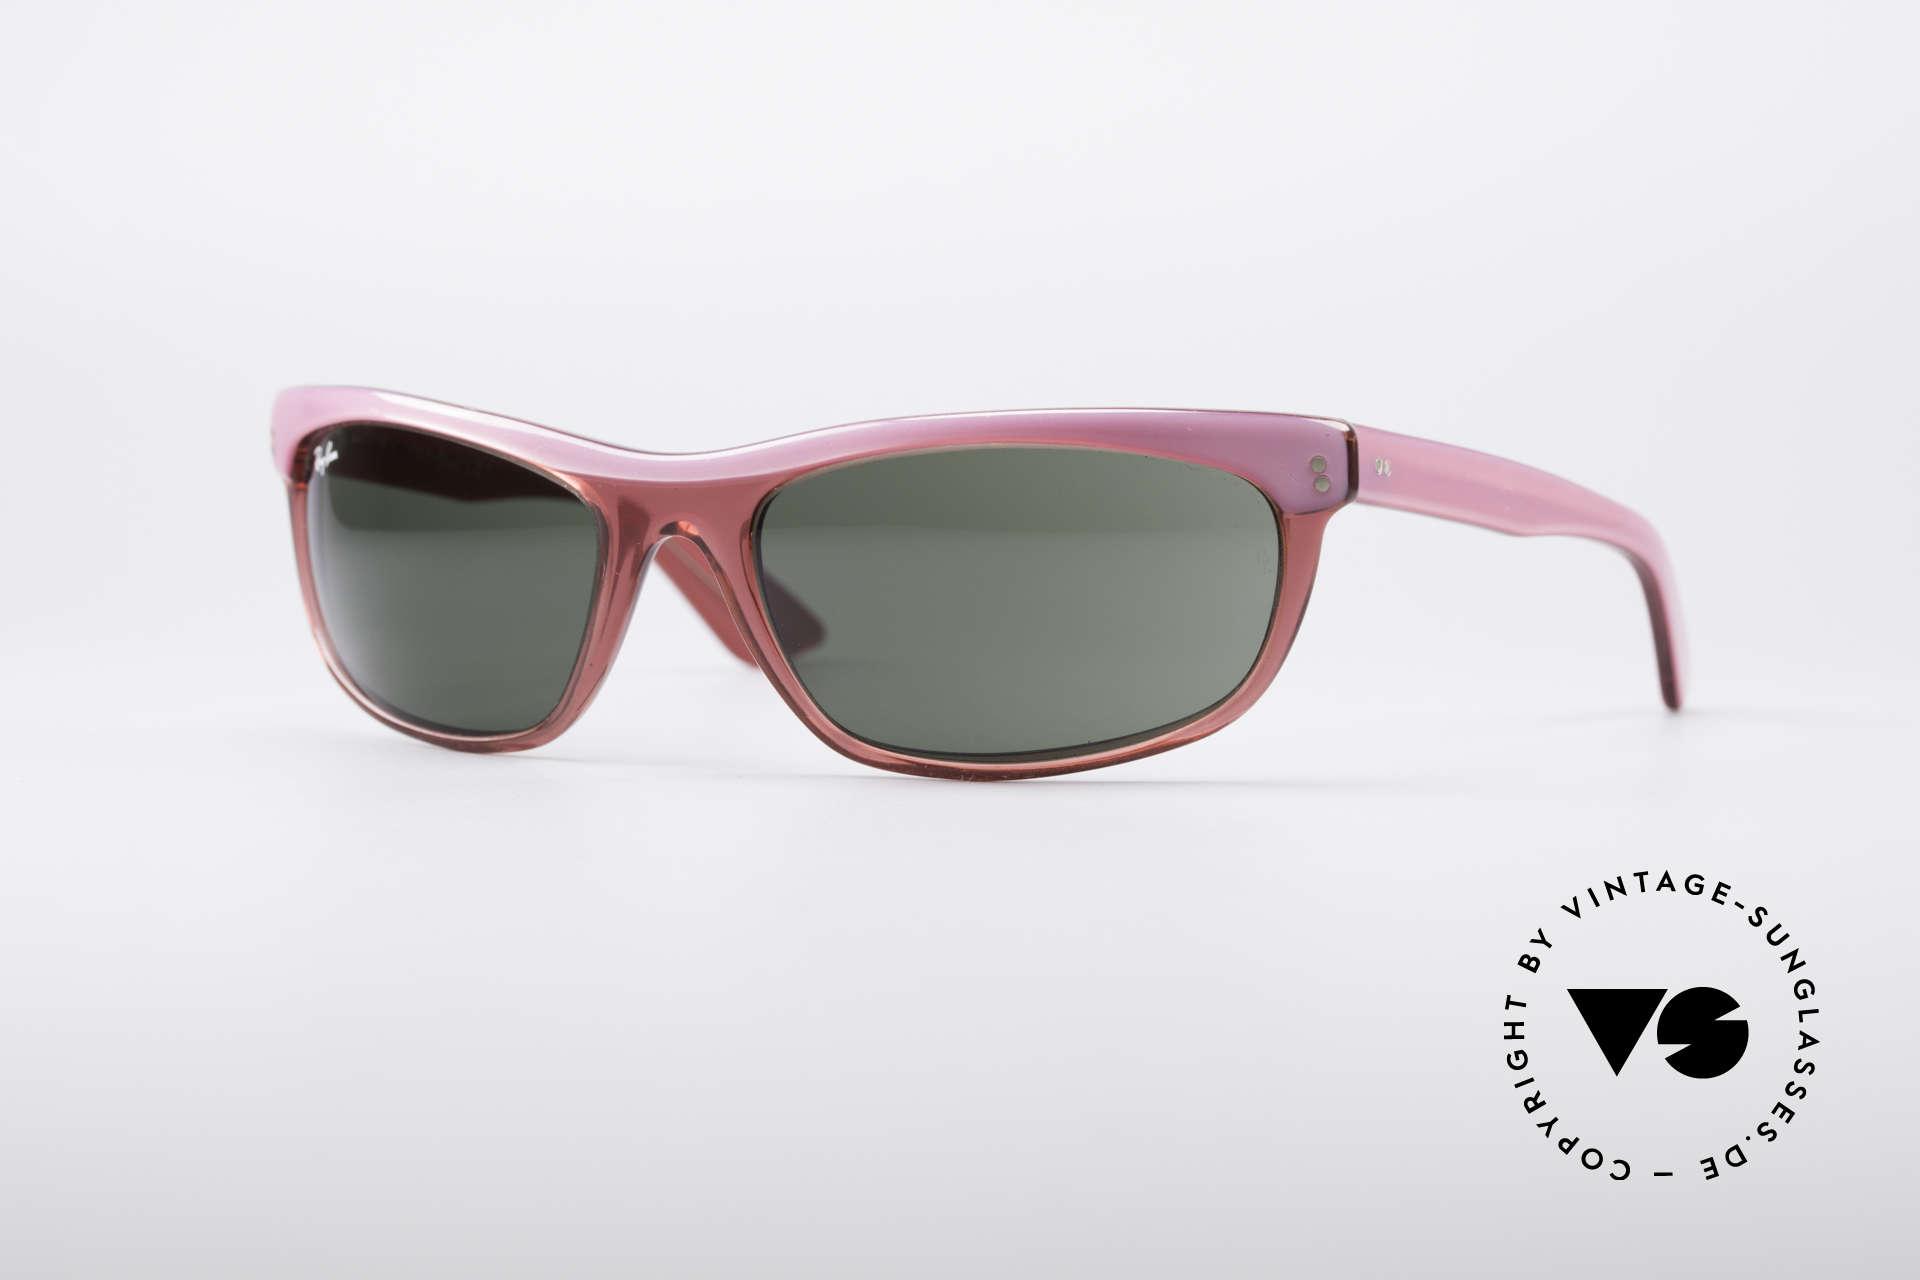 3222bb1ec4f7 Sunglasses Ray Ban Balorama Clint Eastwood Shades | Vintage Sunglasses